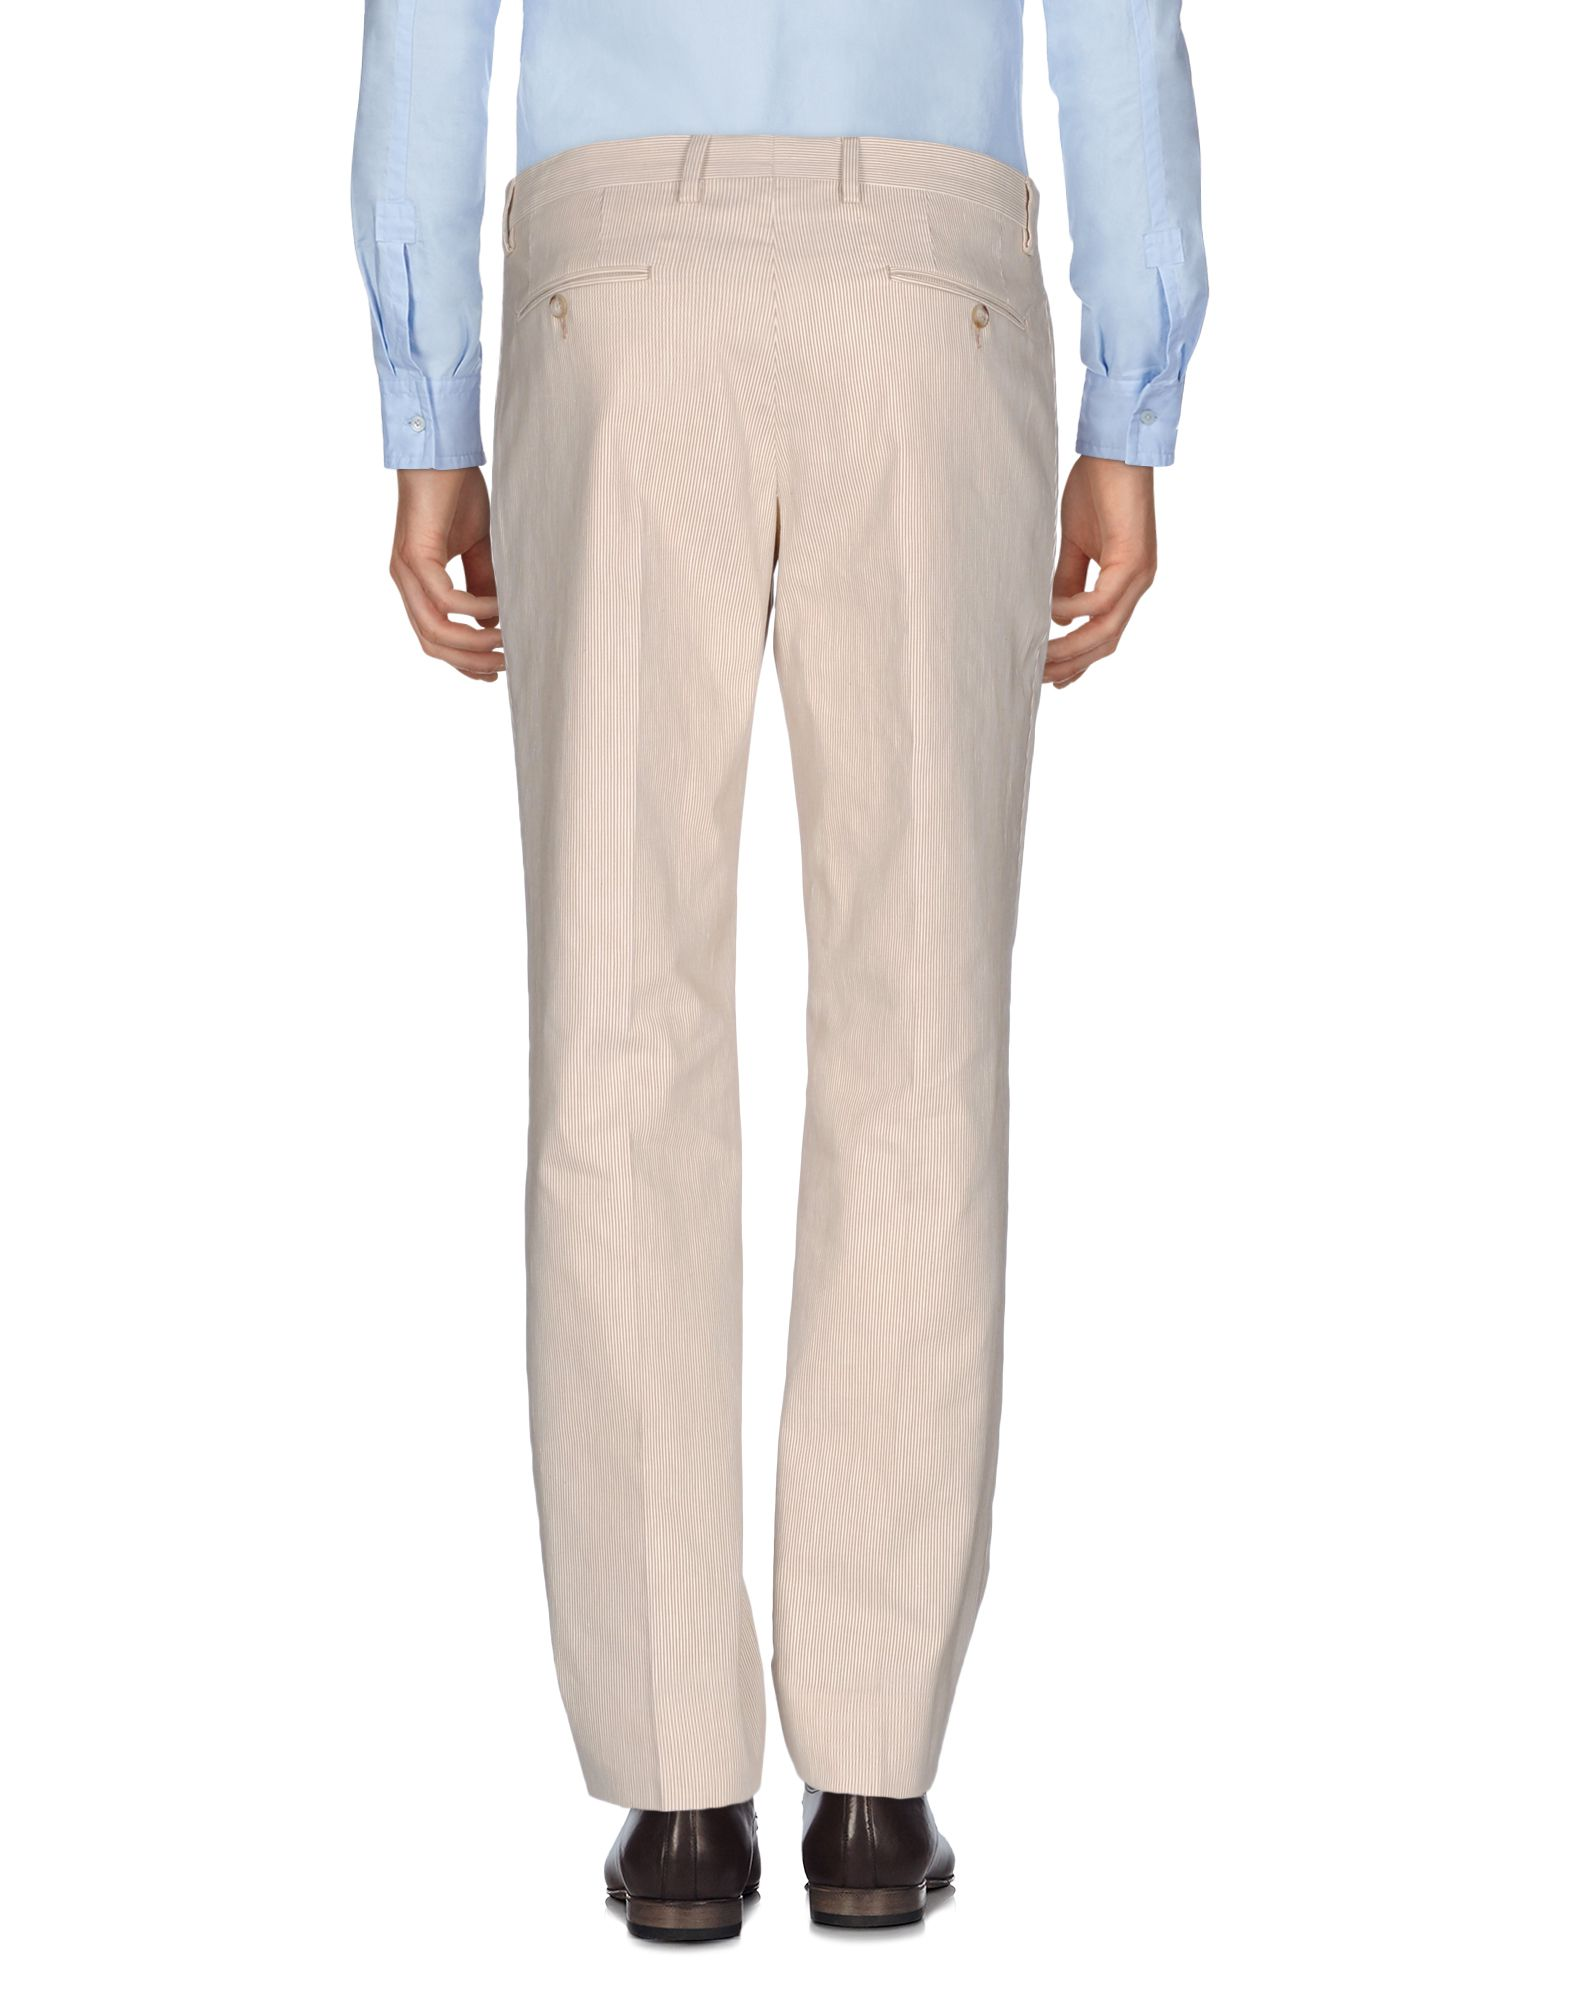 Pantalone Dolce & Gabbana Uomo - 13017179VH 13017179VH 13017179VH 7f5477